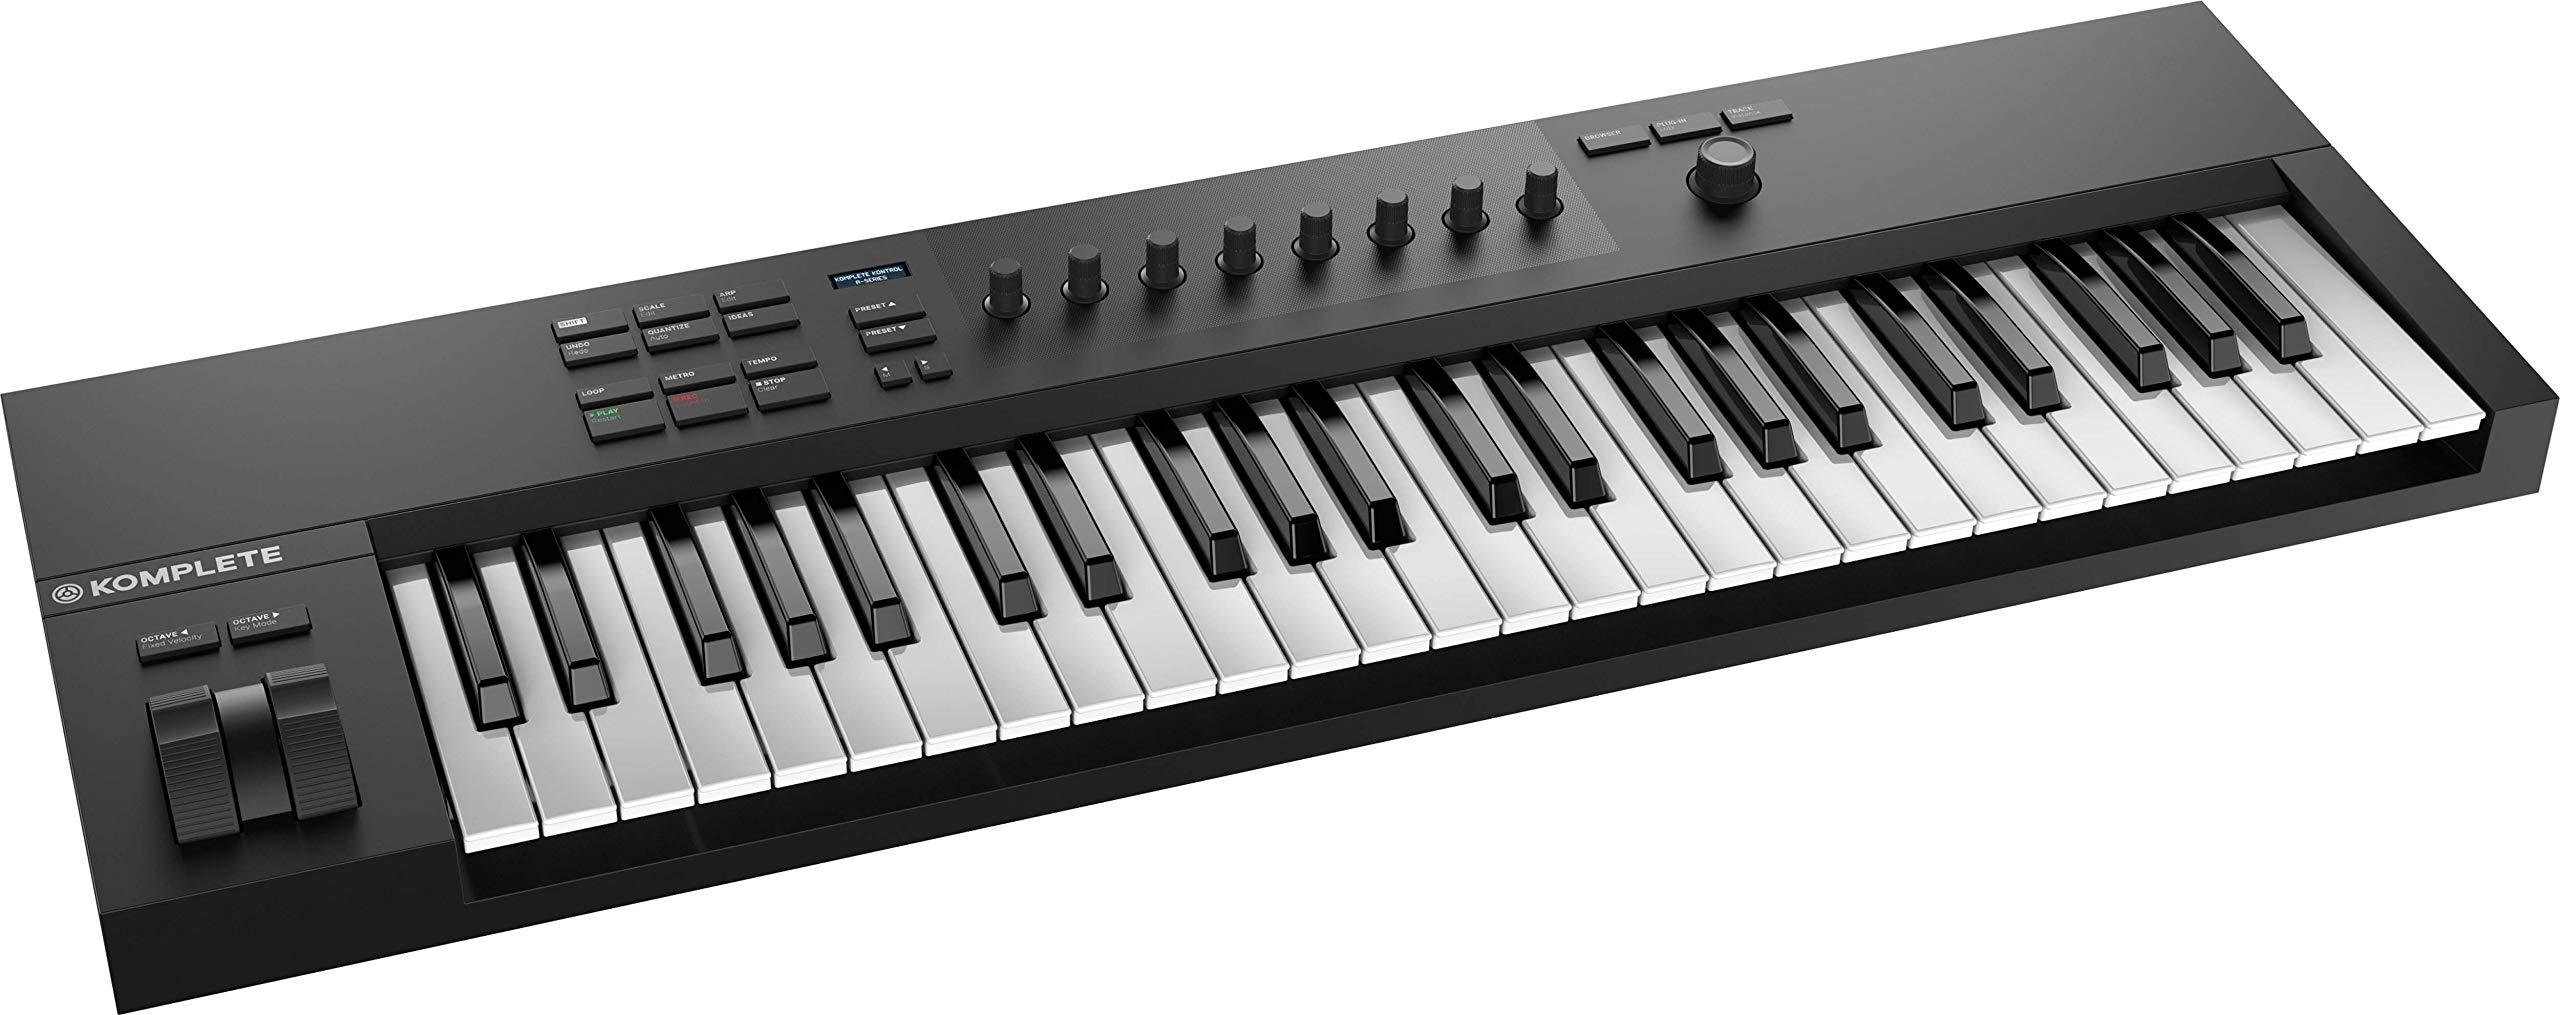 Native Instruments Komplete Kontrol A49 Controller Keyboard by Native Instruments